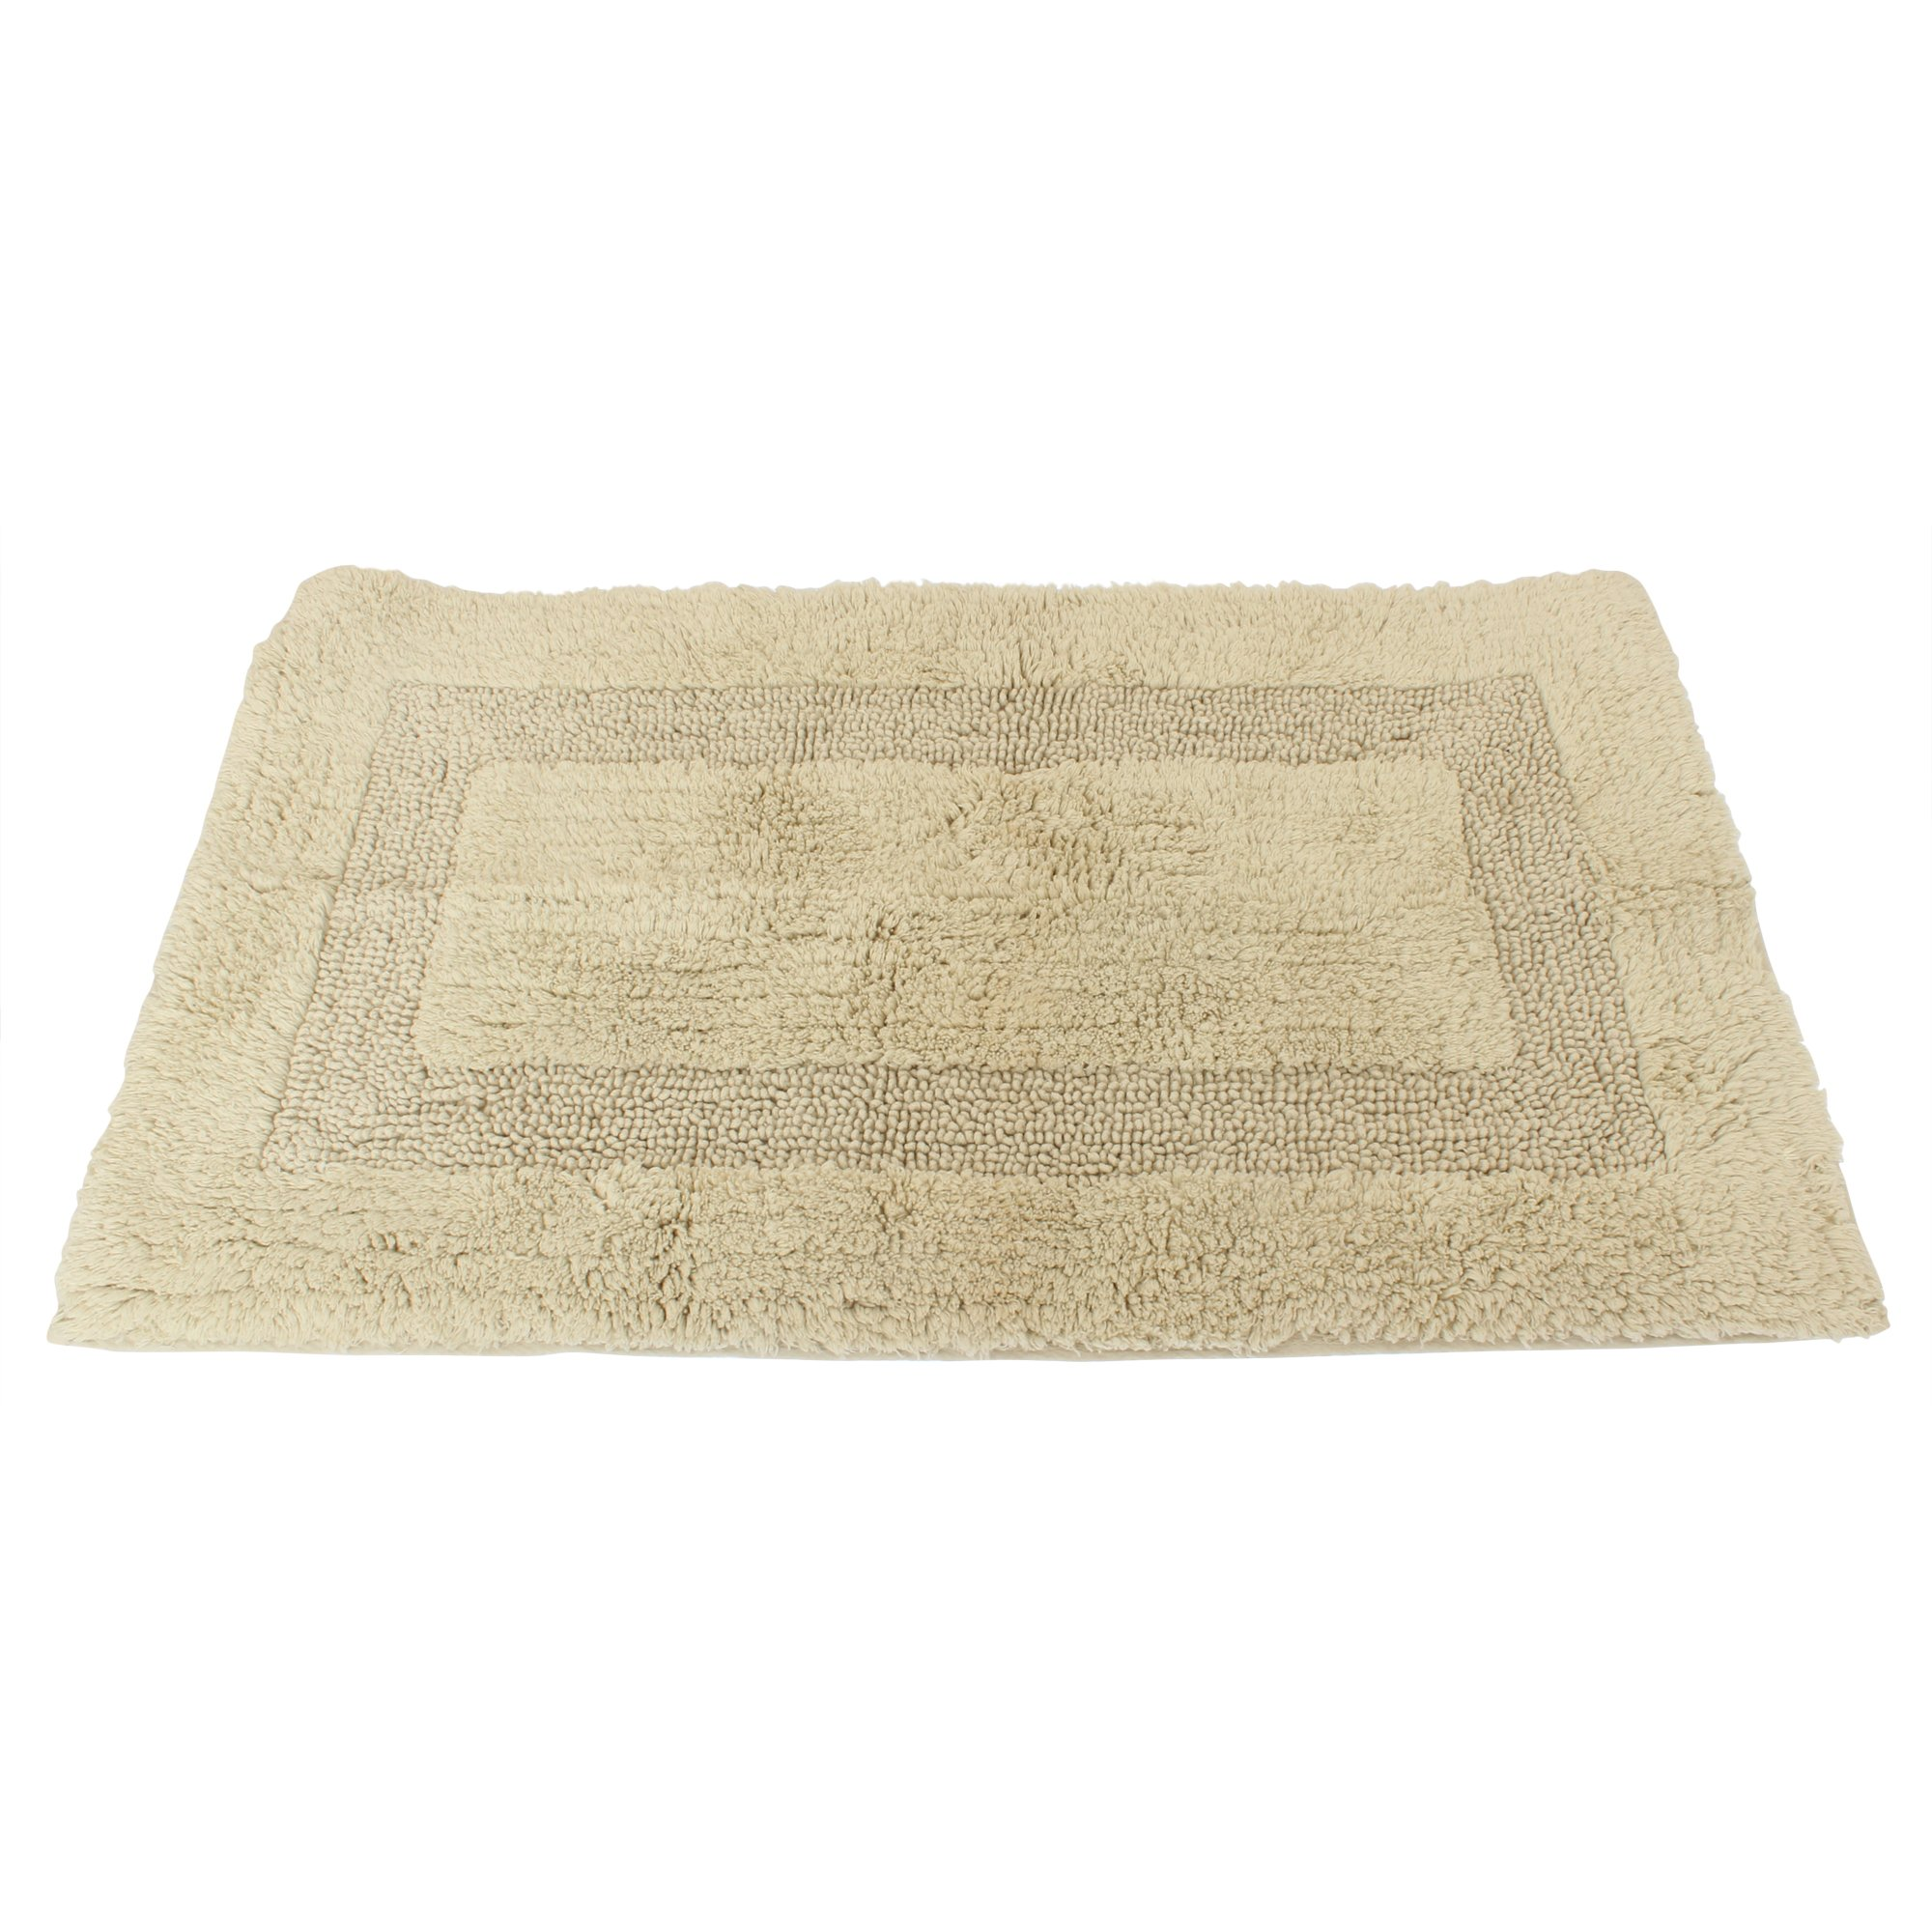 100 cotton olympia design bathroom bath mat rug ebay. Black Bedroom Furniture Sets. Home Design Ideas